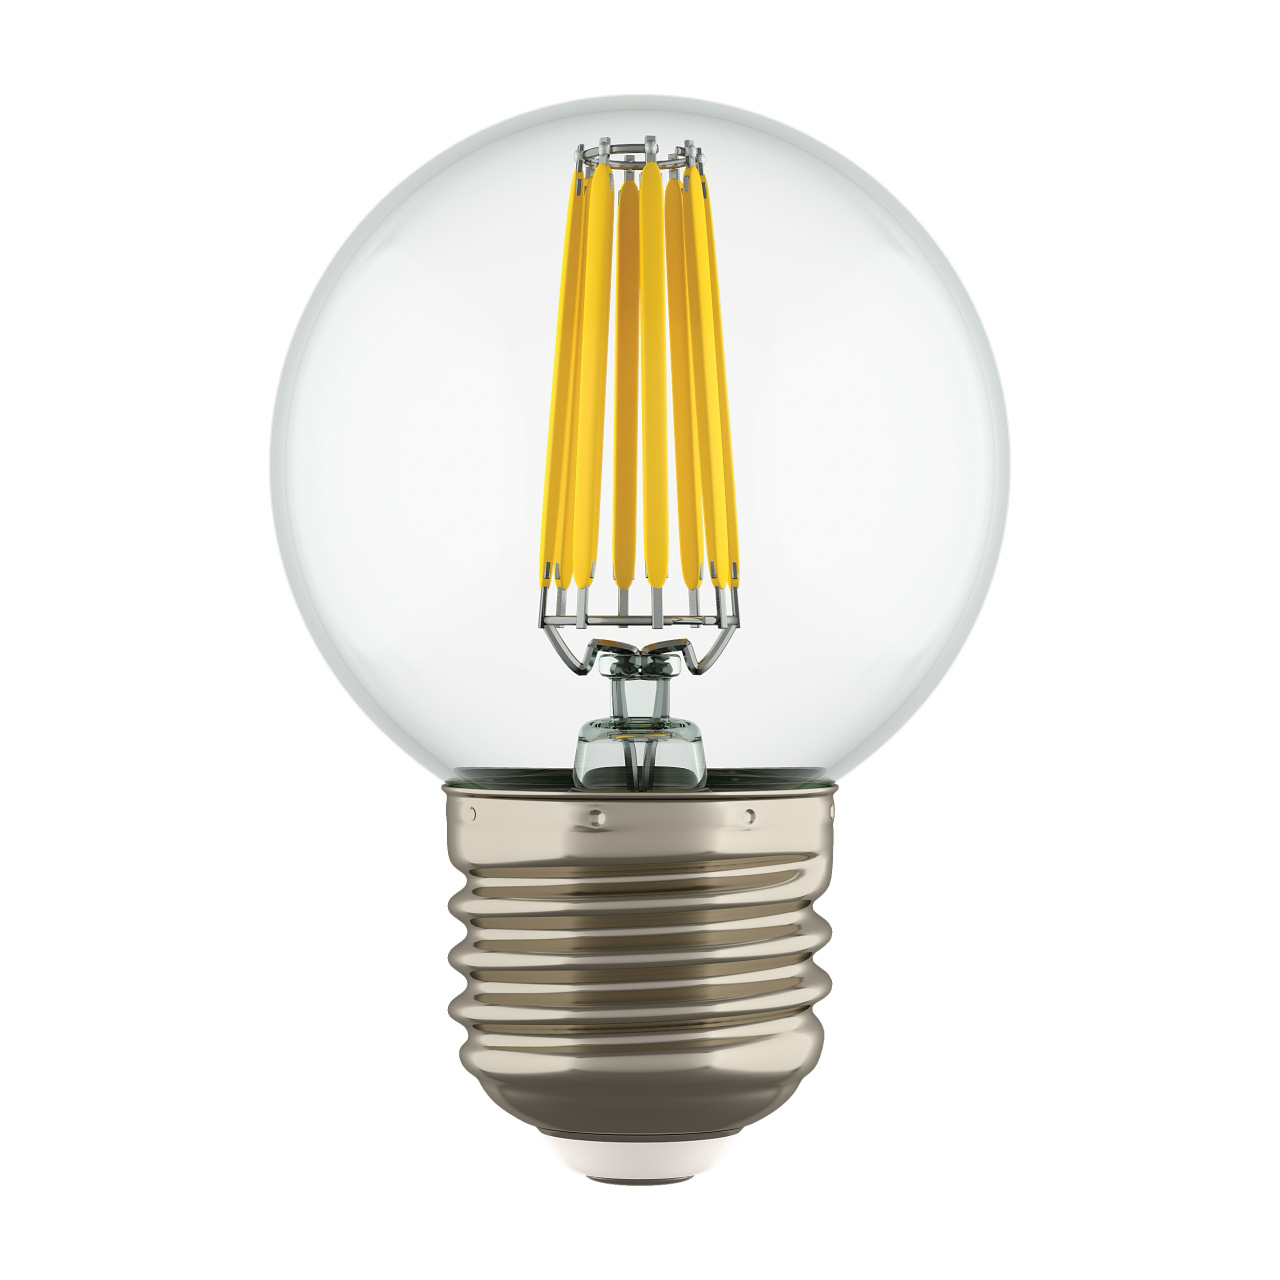 Лампа LED Filament 220V G50 E27 6W=65W 400-430LM 360G CL 4000K 30000H Lightstar 933824